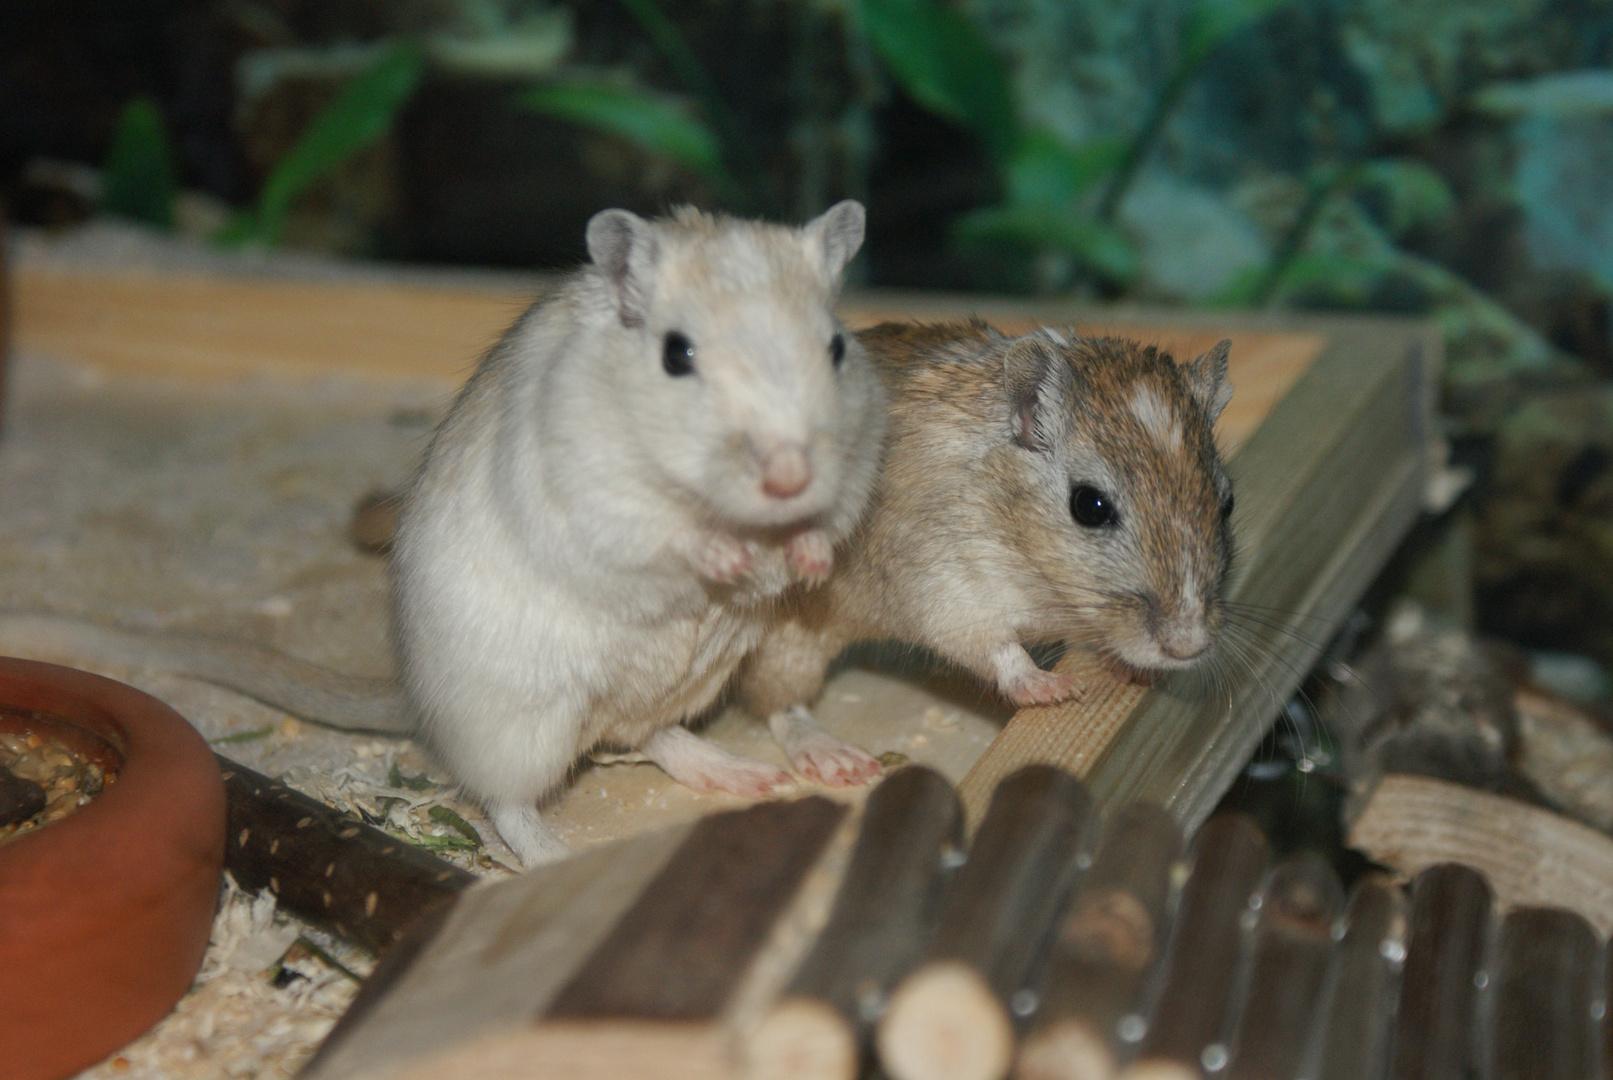 Micky & Minni